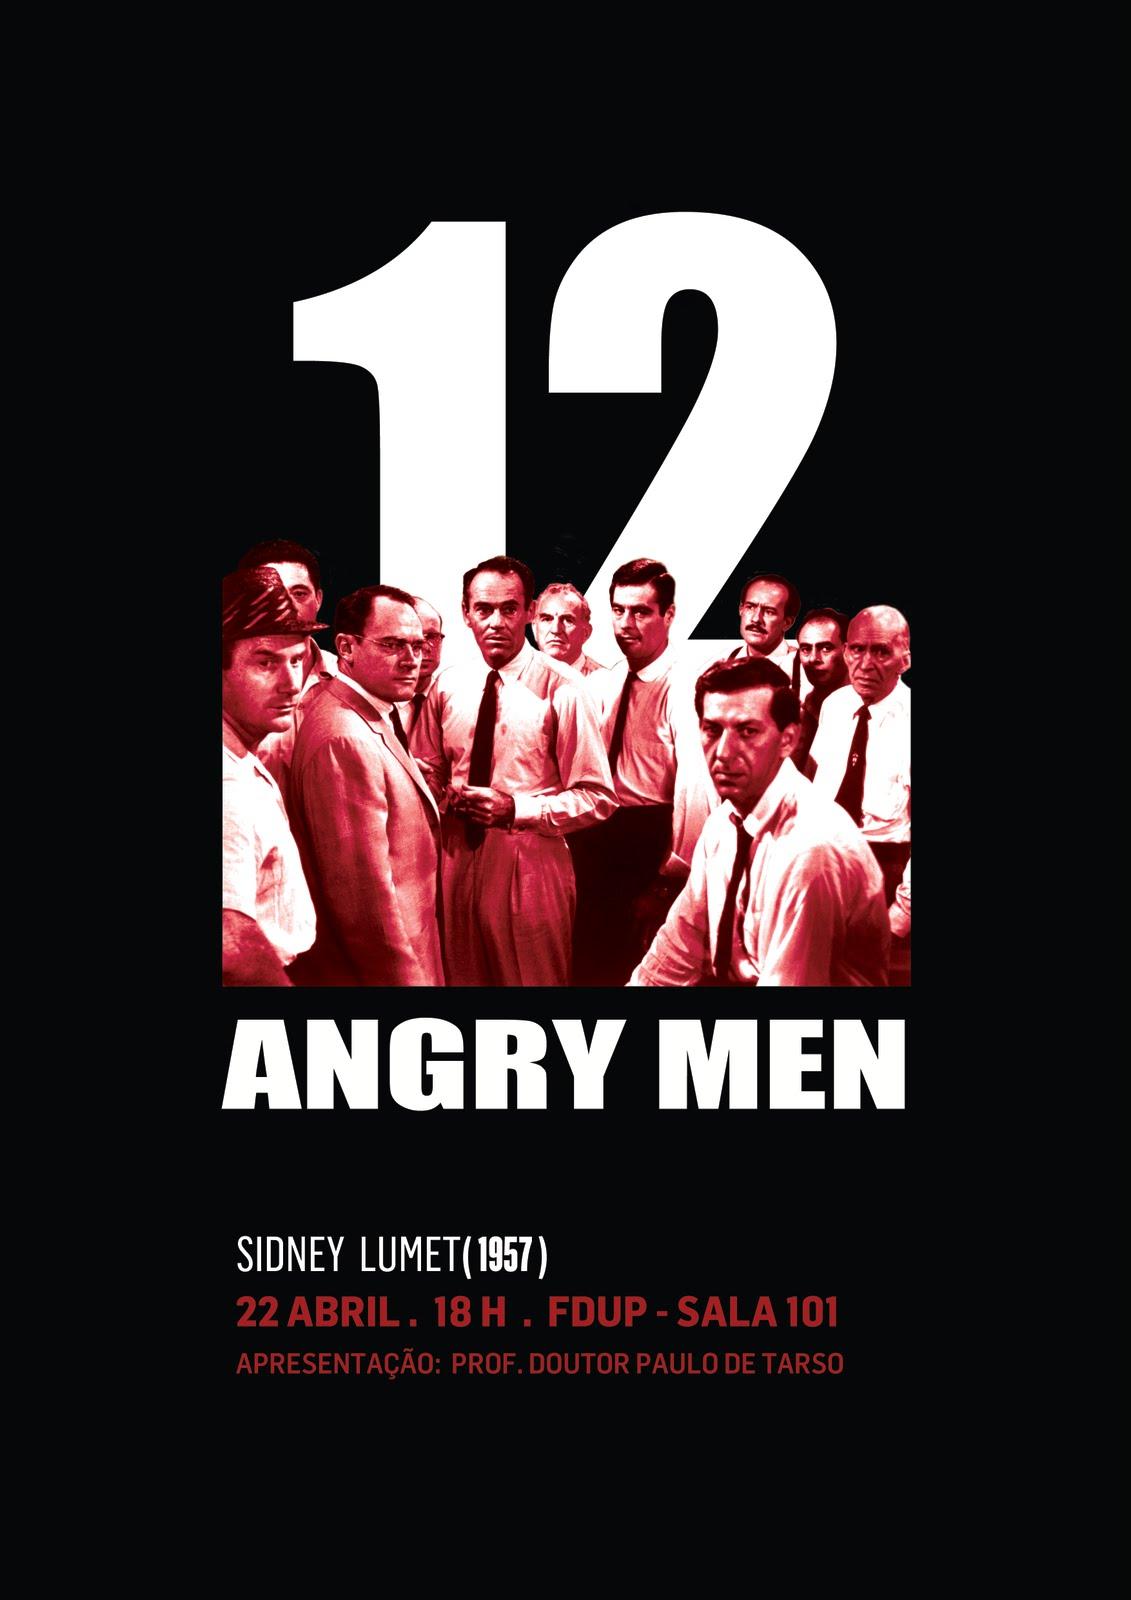 12 angry men by daniella portelada Anencefalia ang lee angela merkel angeli angelina jolie ângelo  alencar ângelo vanhoni angola angra dos reis-rj angry birds angry  toucans.